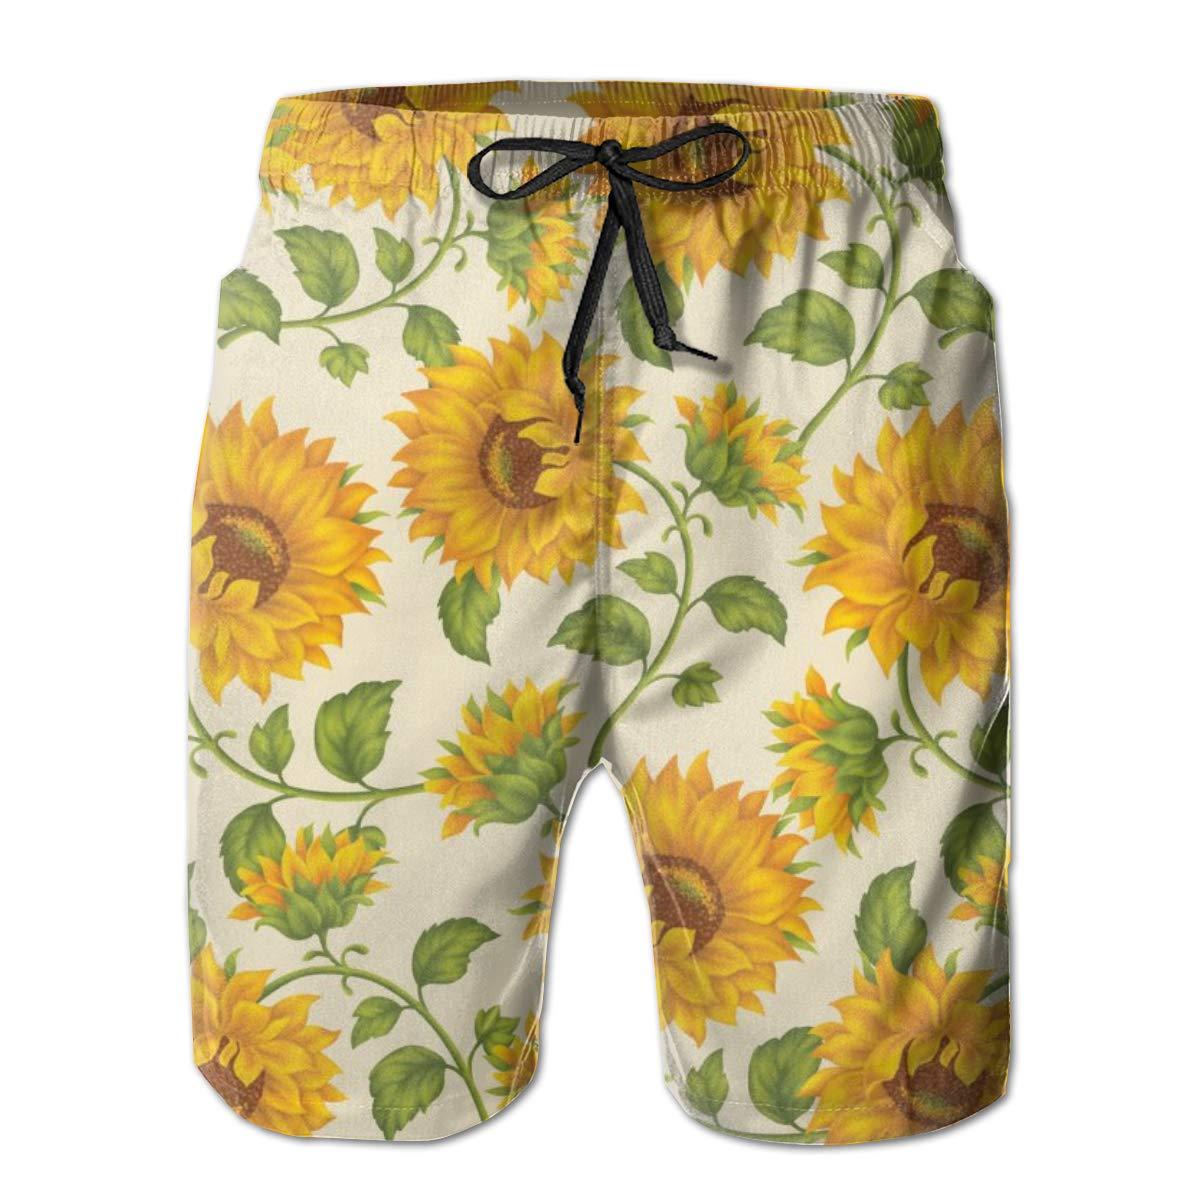 WMDJEG Sunflower Print Mens Summer Beachwear Sports Running Swim Board Shorts Mesh Lining